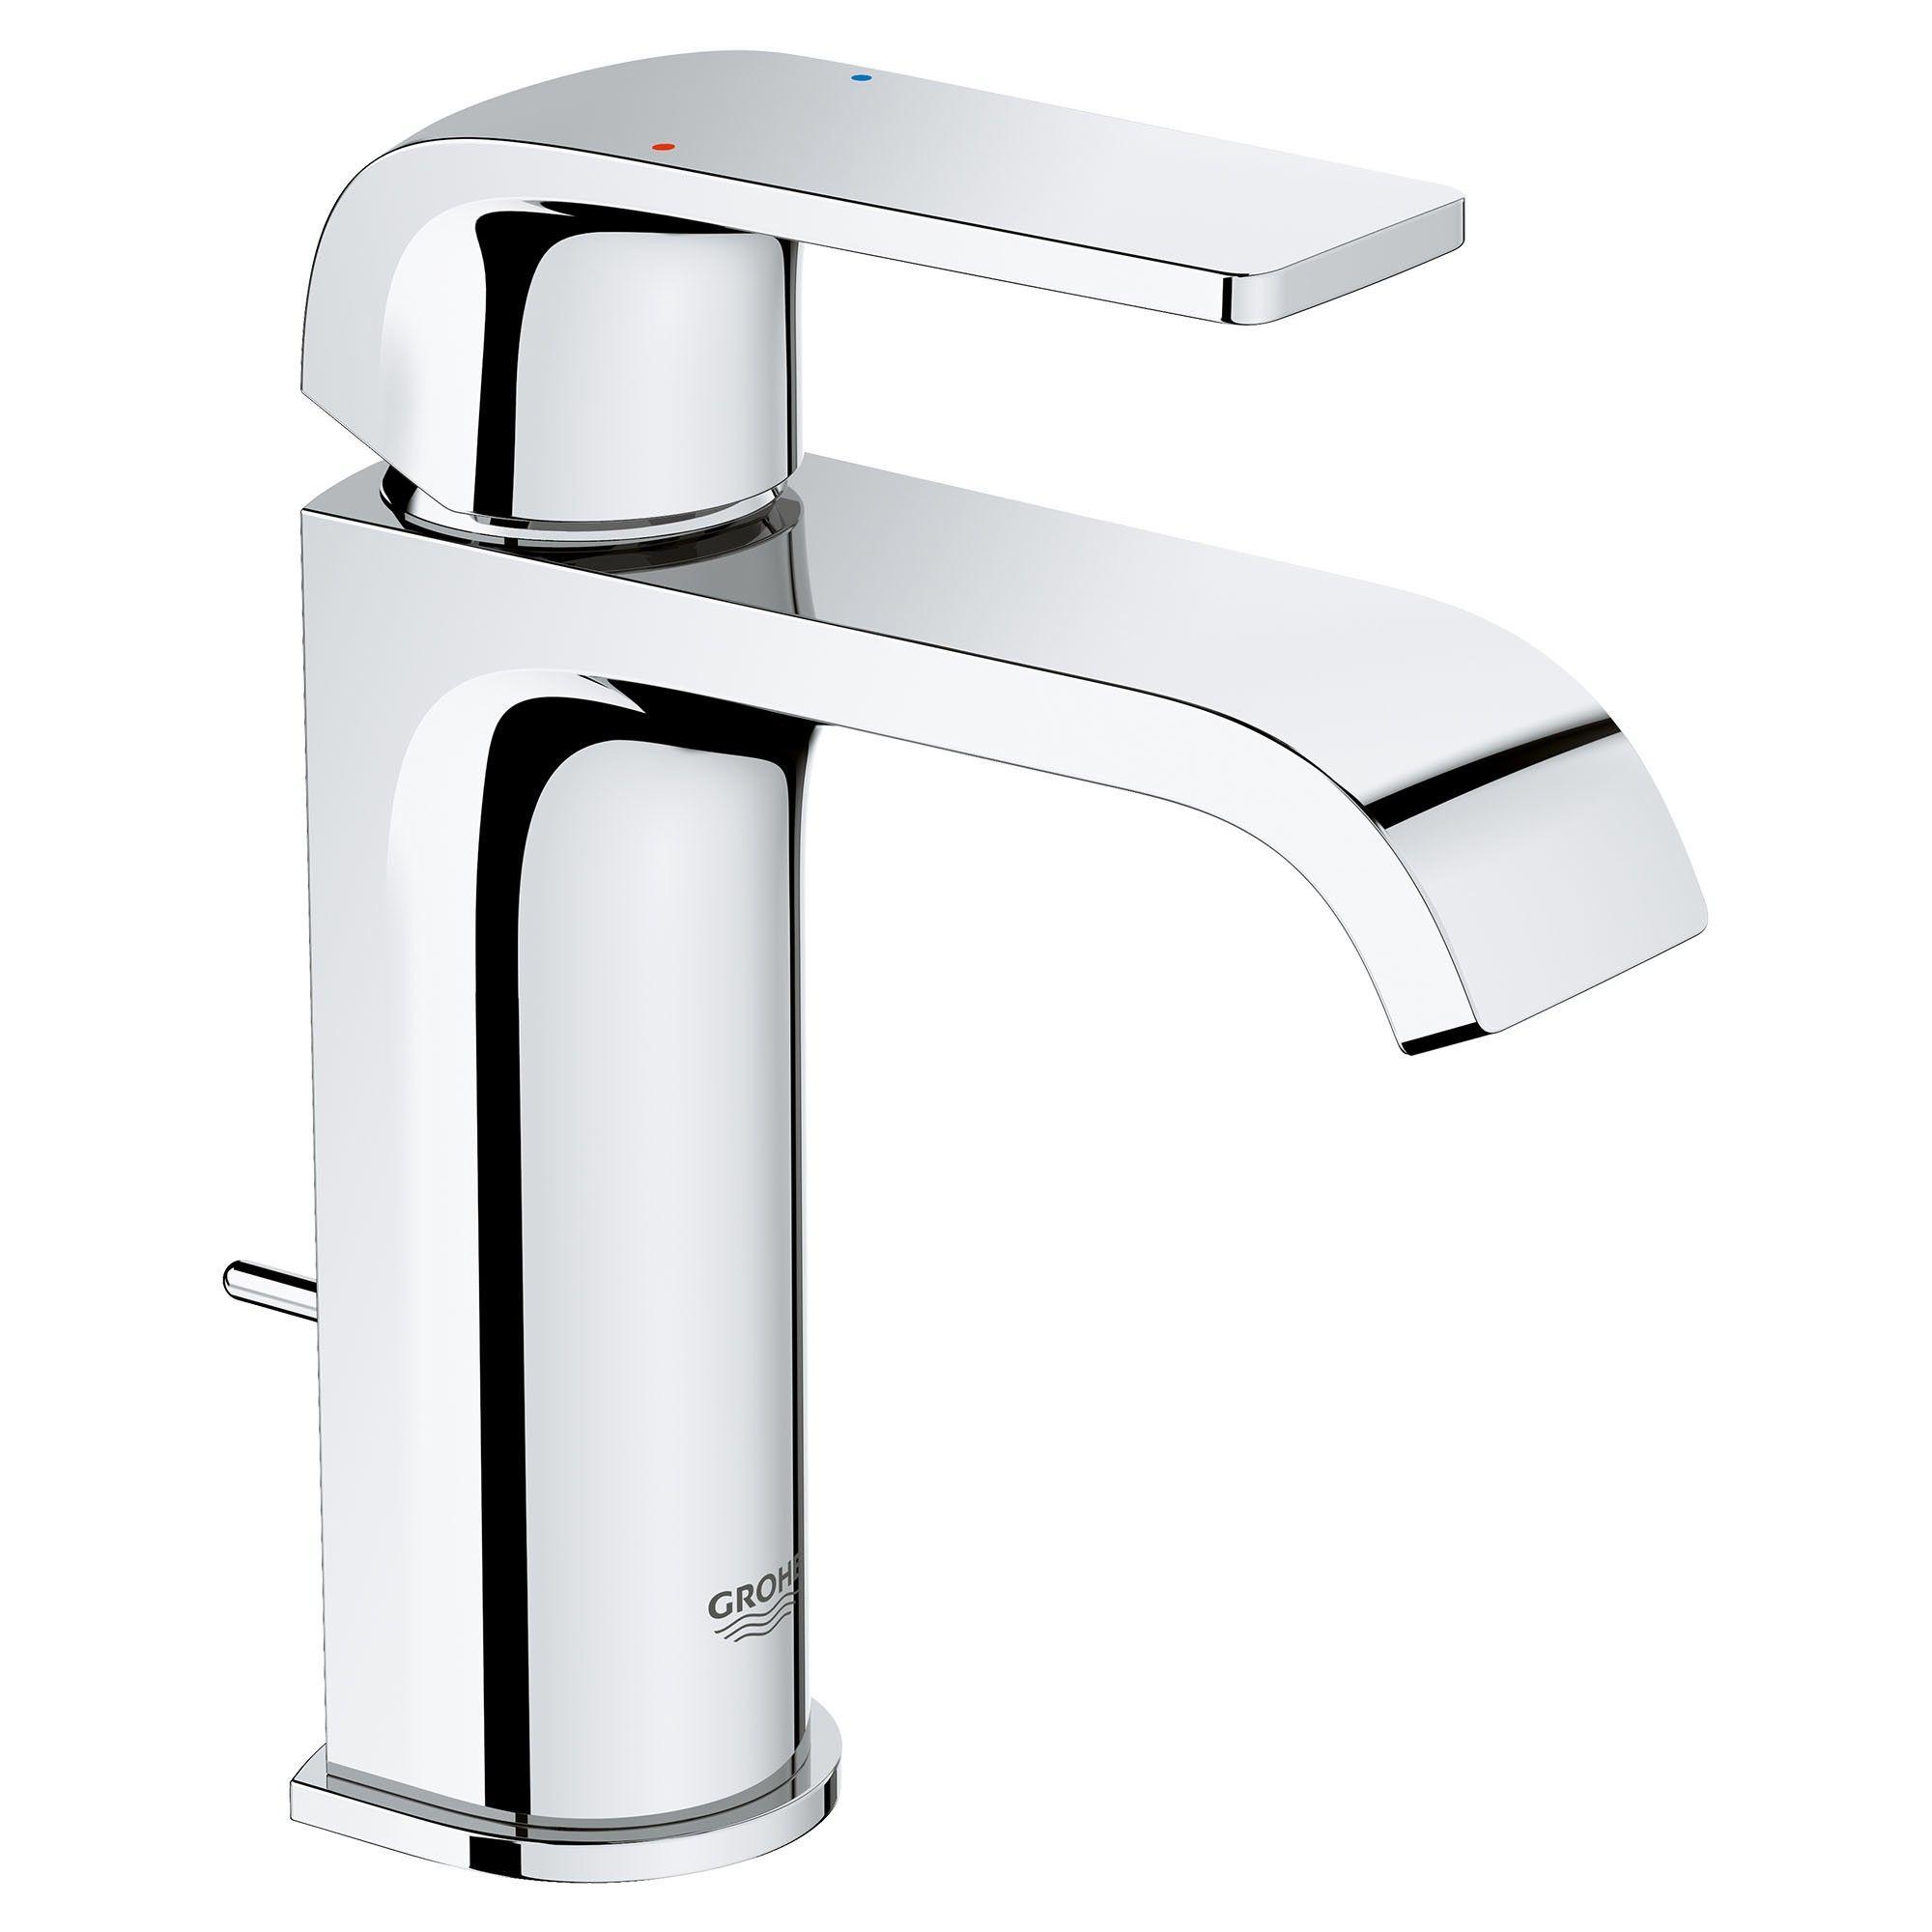 Grohe America Inc 23 868 Defined 1 2 Gpm Single Hole Bathroom Faucet Starlight Chrome Single Hole Bathroom Faucet Faucet Grohe [ 2000 x 2000 Pixel ]